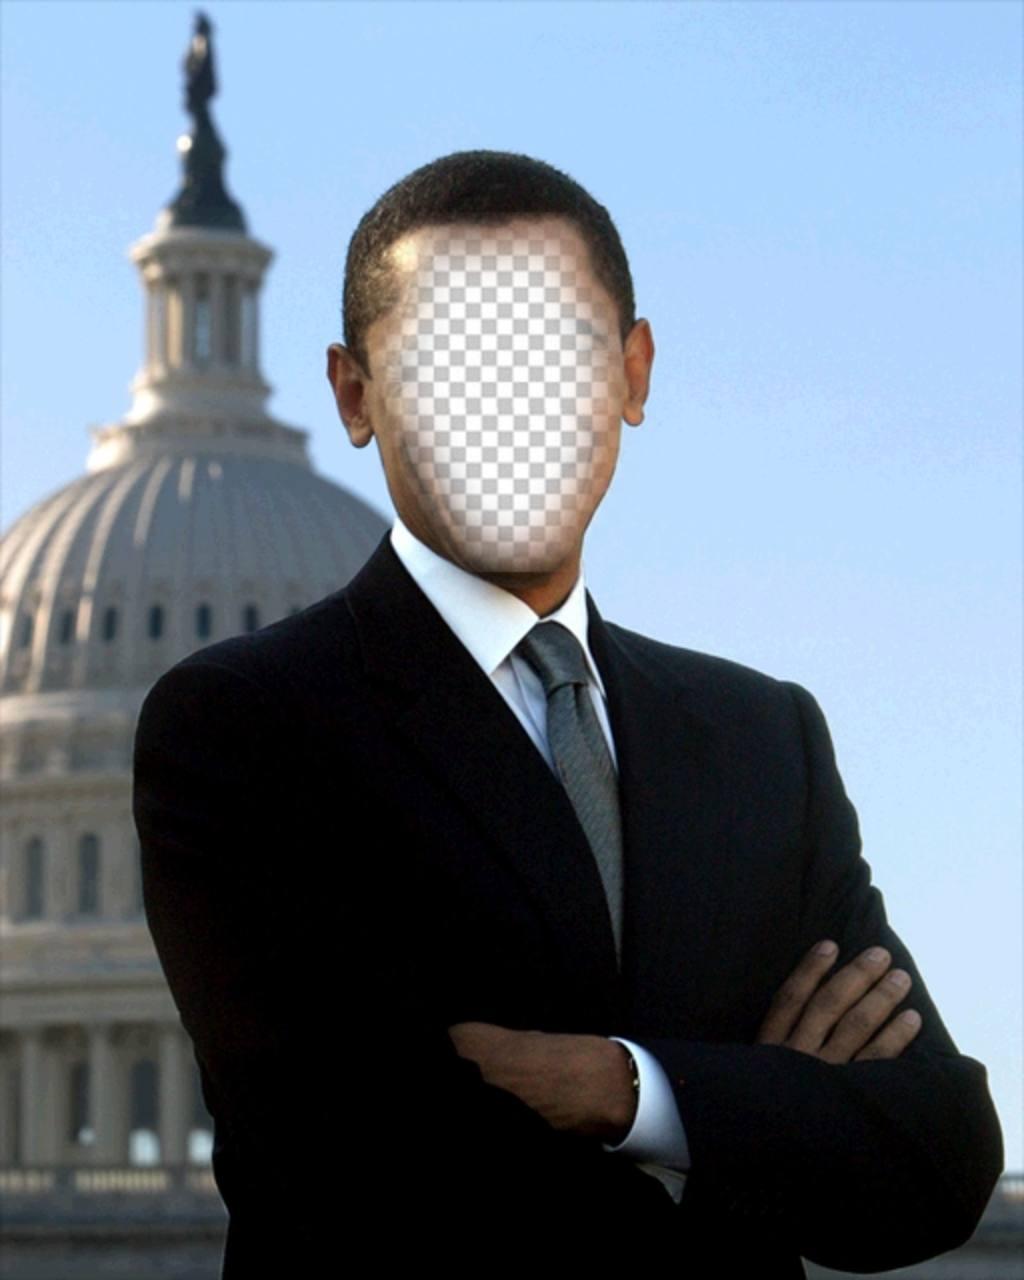 Photomontage of Barack Obama, president of USA to put your photo